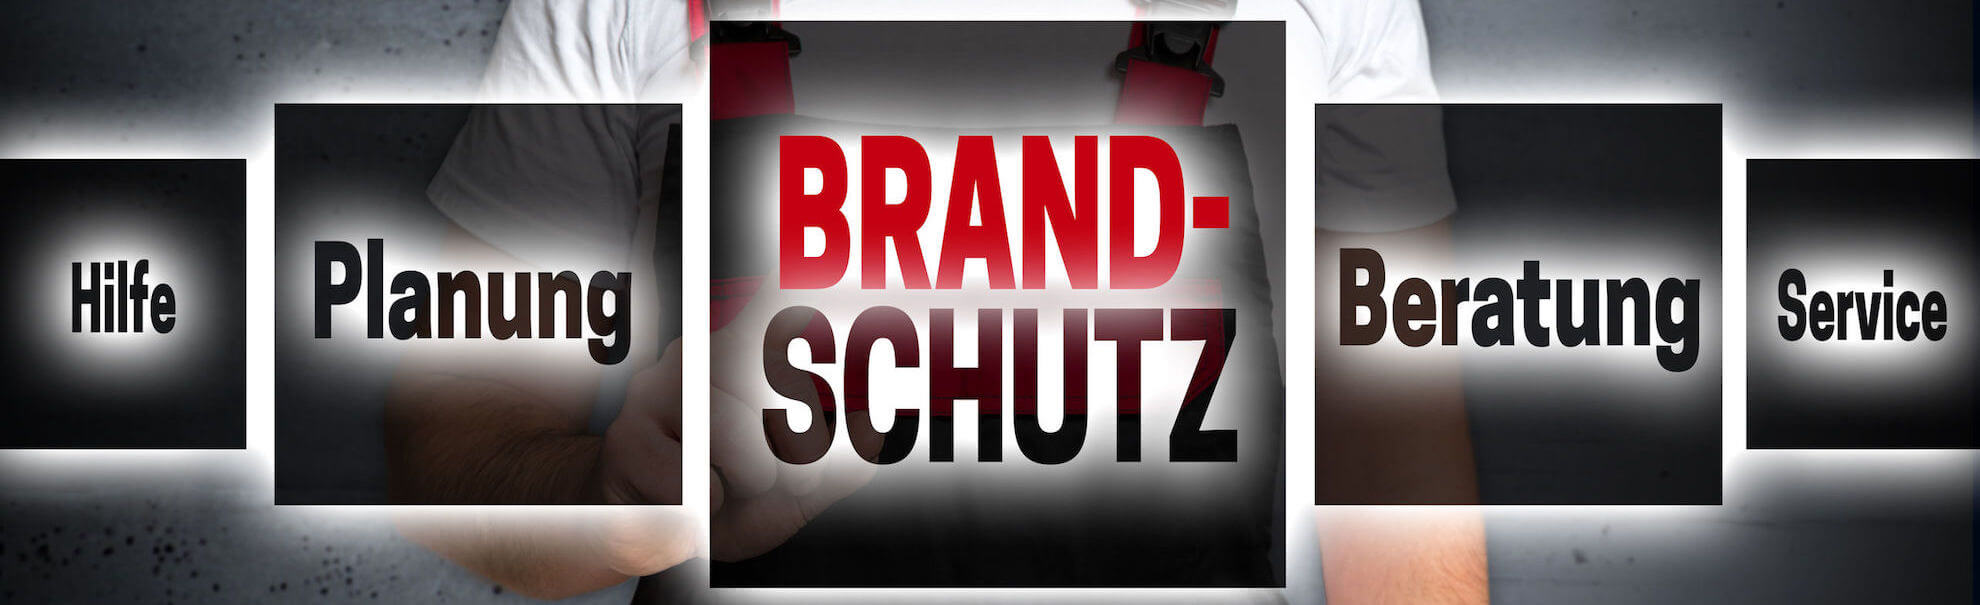 brandschutz-falke-sicherheitstechnik-berlin